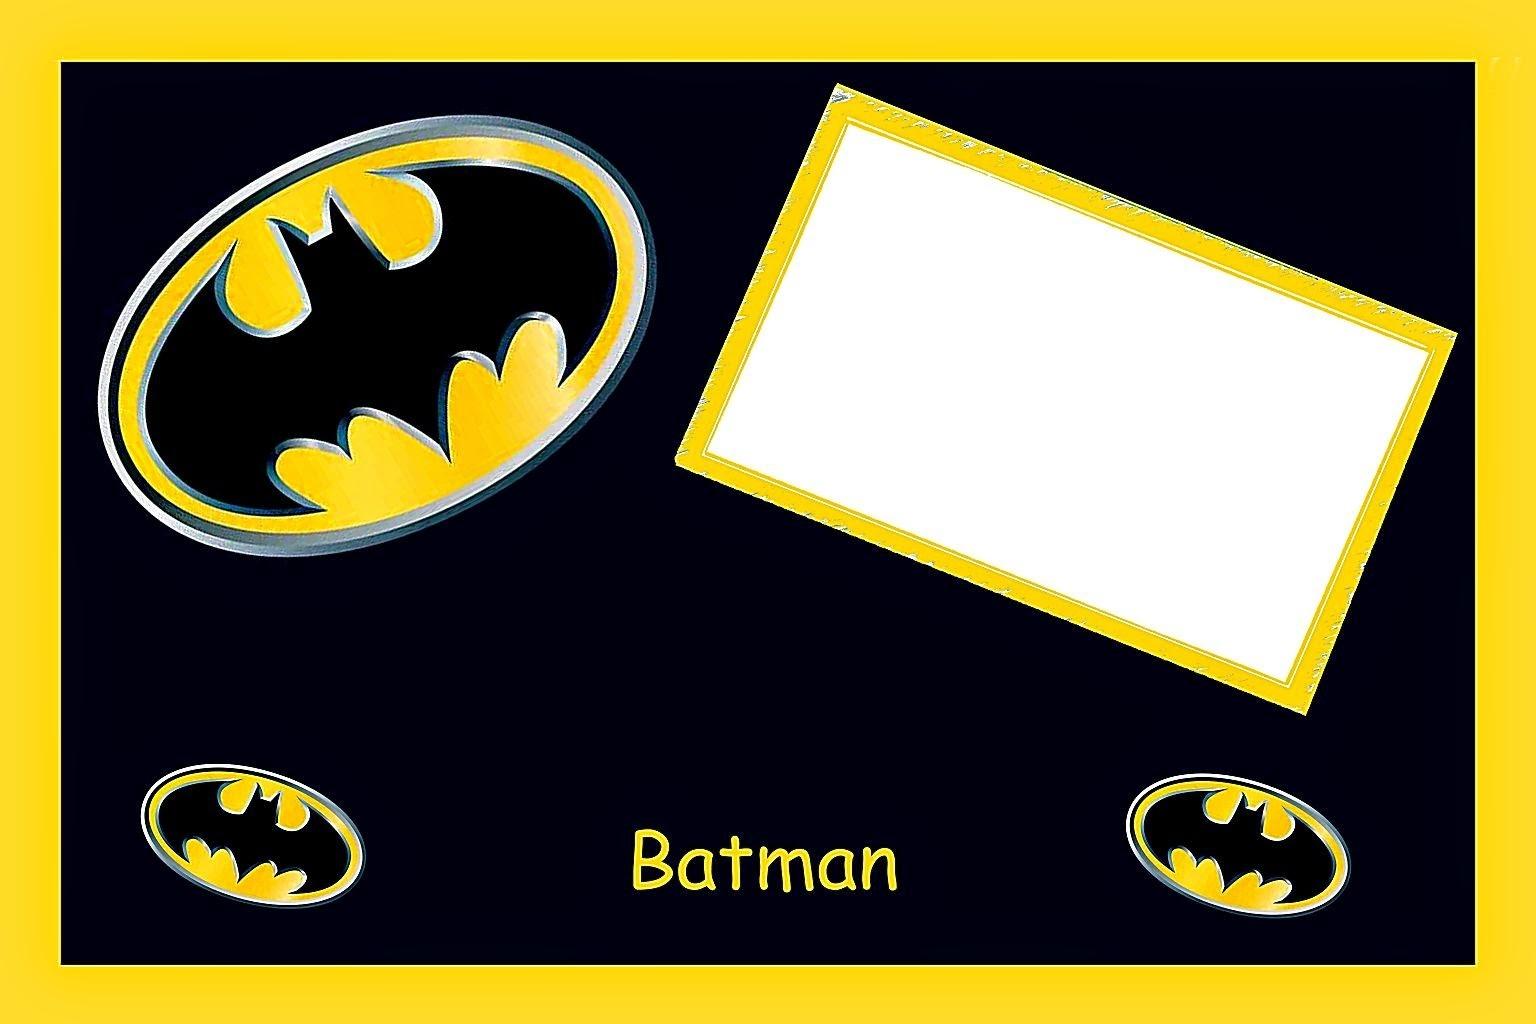 Batman Birthday: Free Printable Cards Or Invitations. - Oh My Fiesta - Free Batman Printables